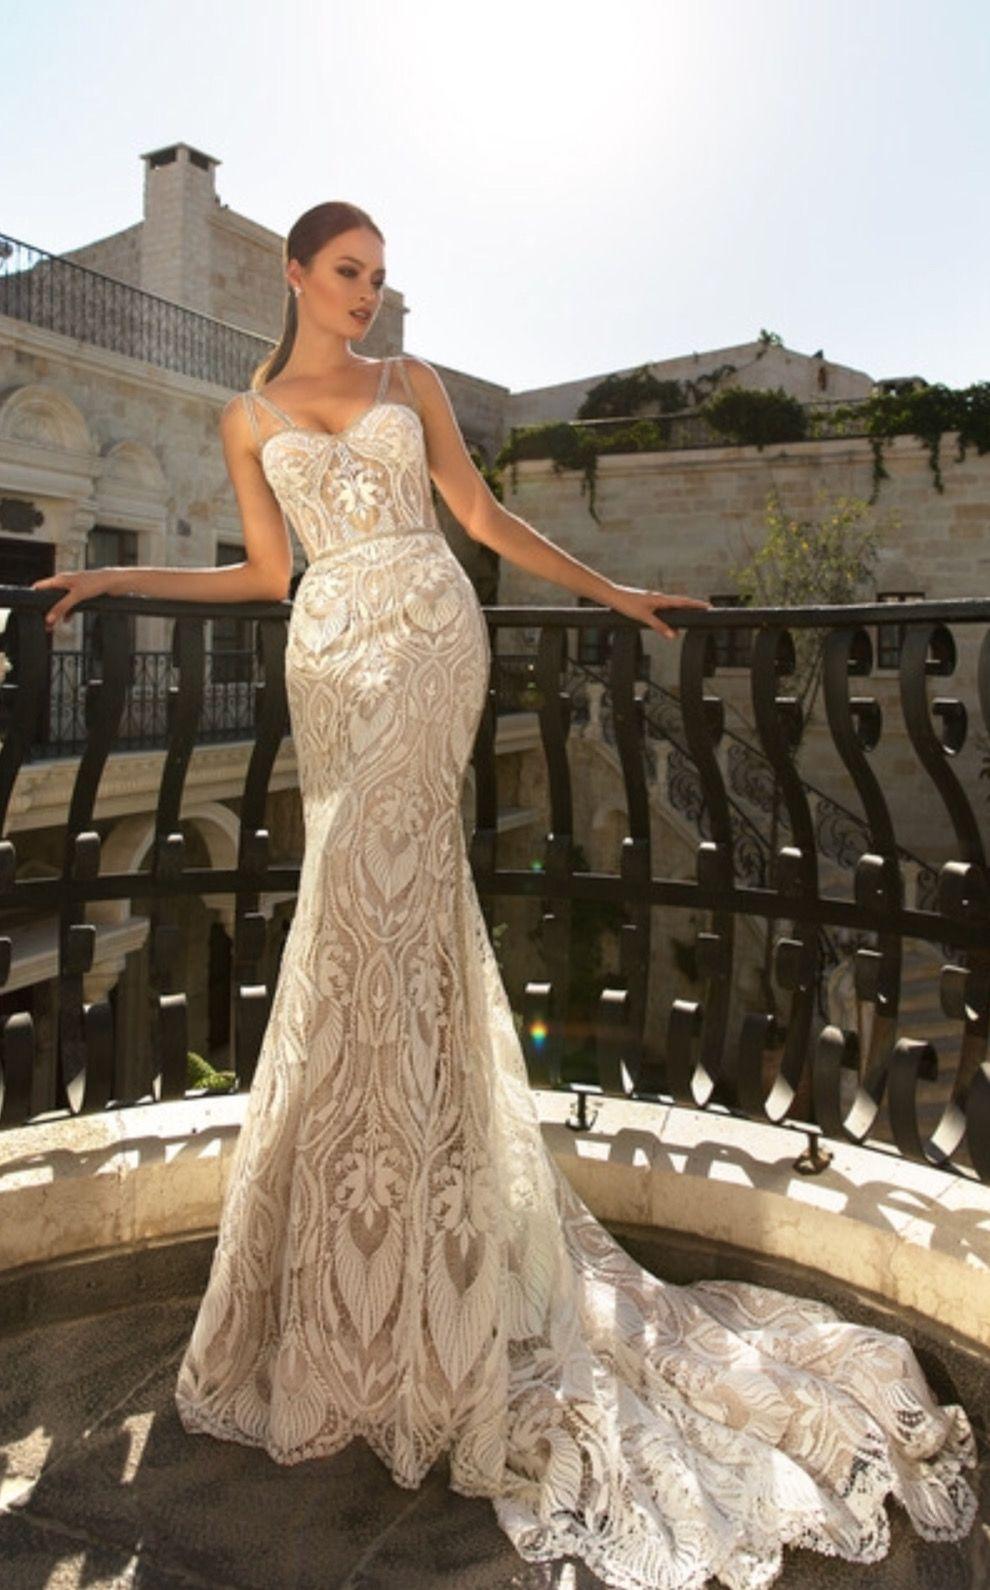 44dd05afc87 Eva Lendel Lexie - The Blushing Bride boutique in Frisco